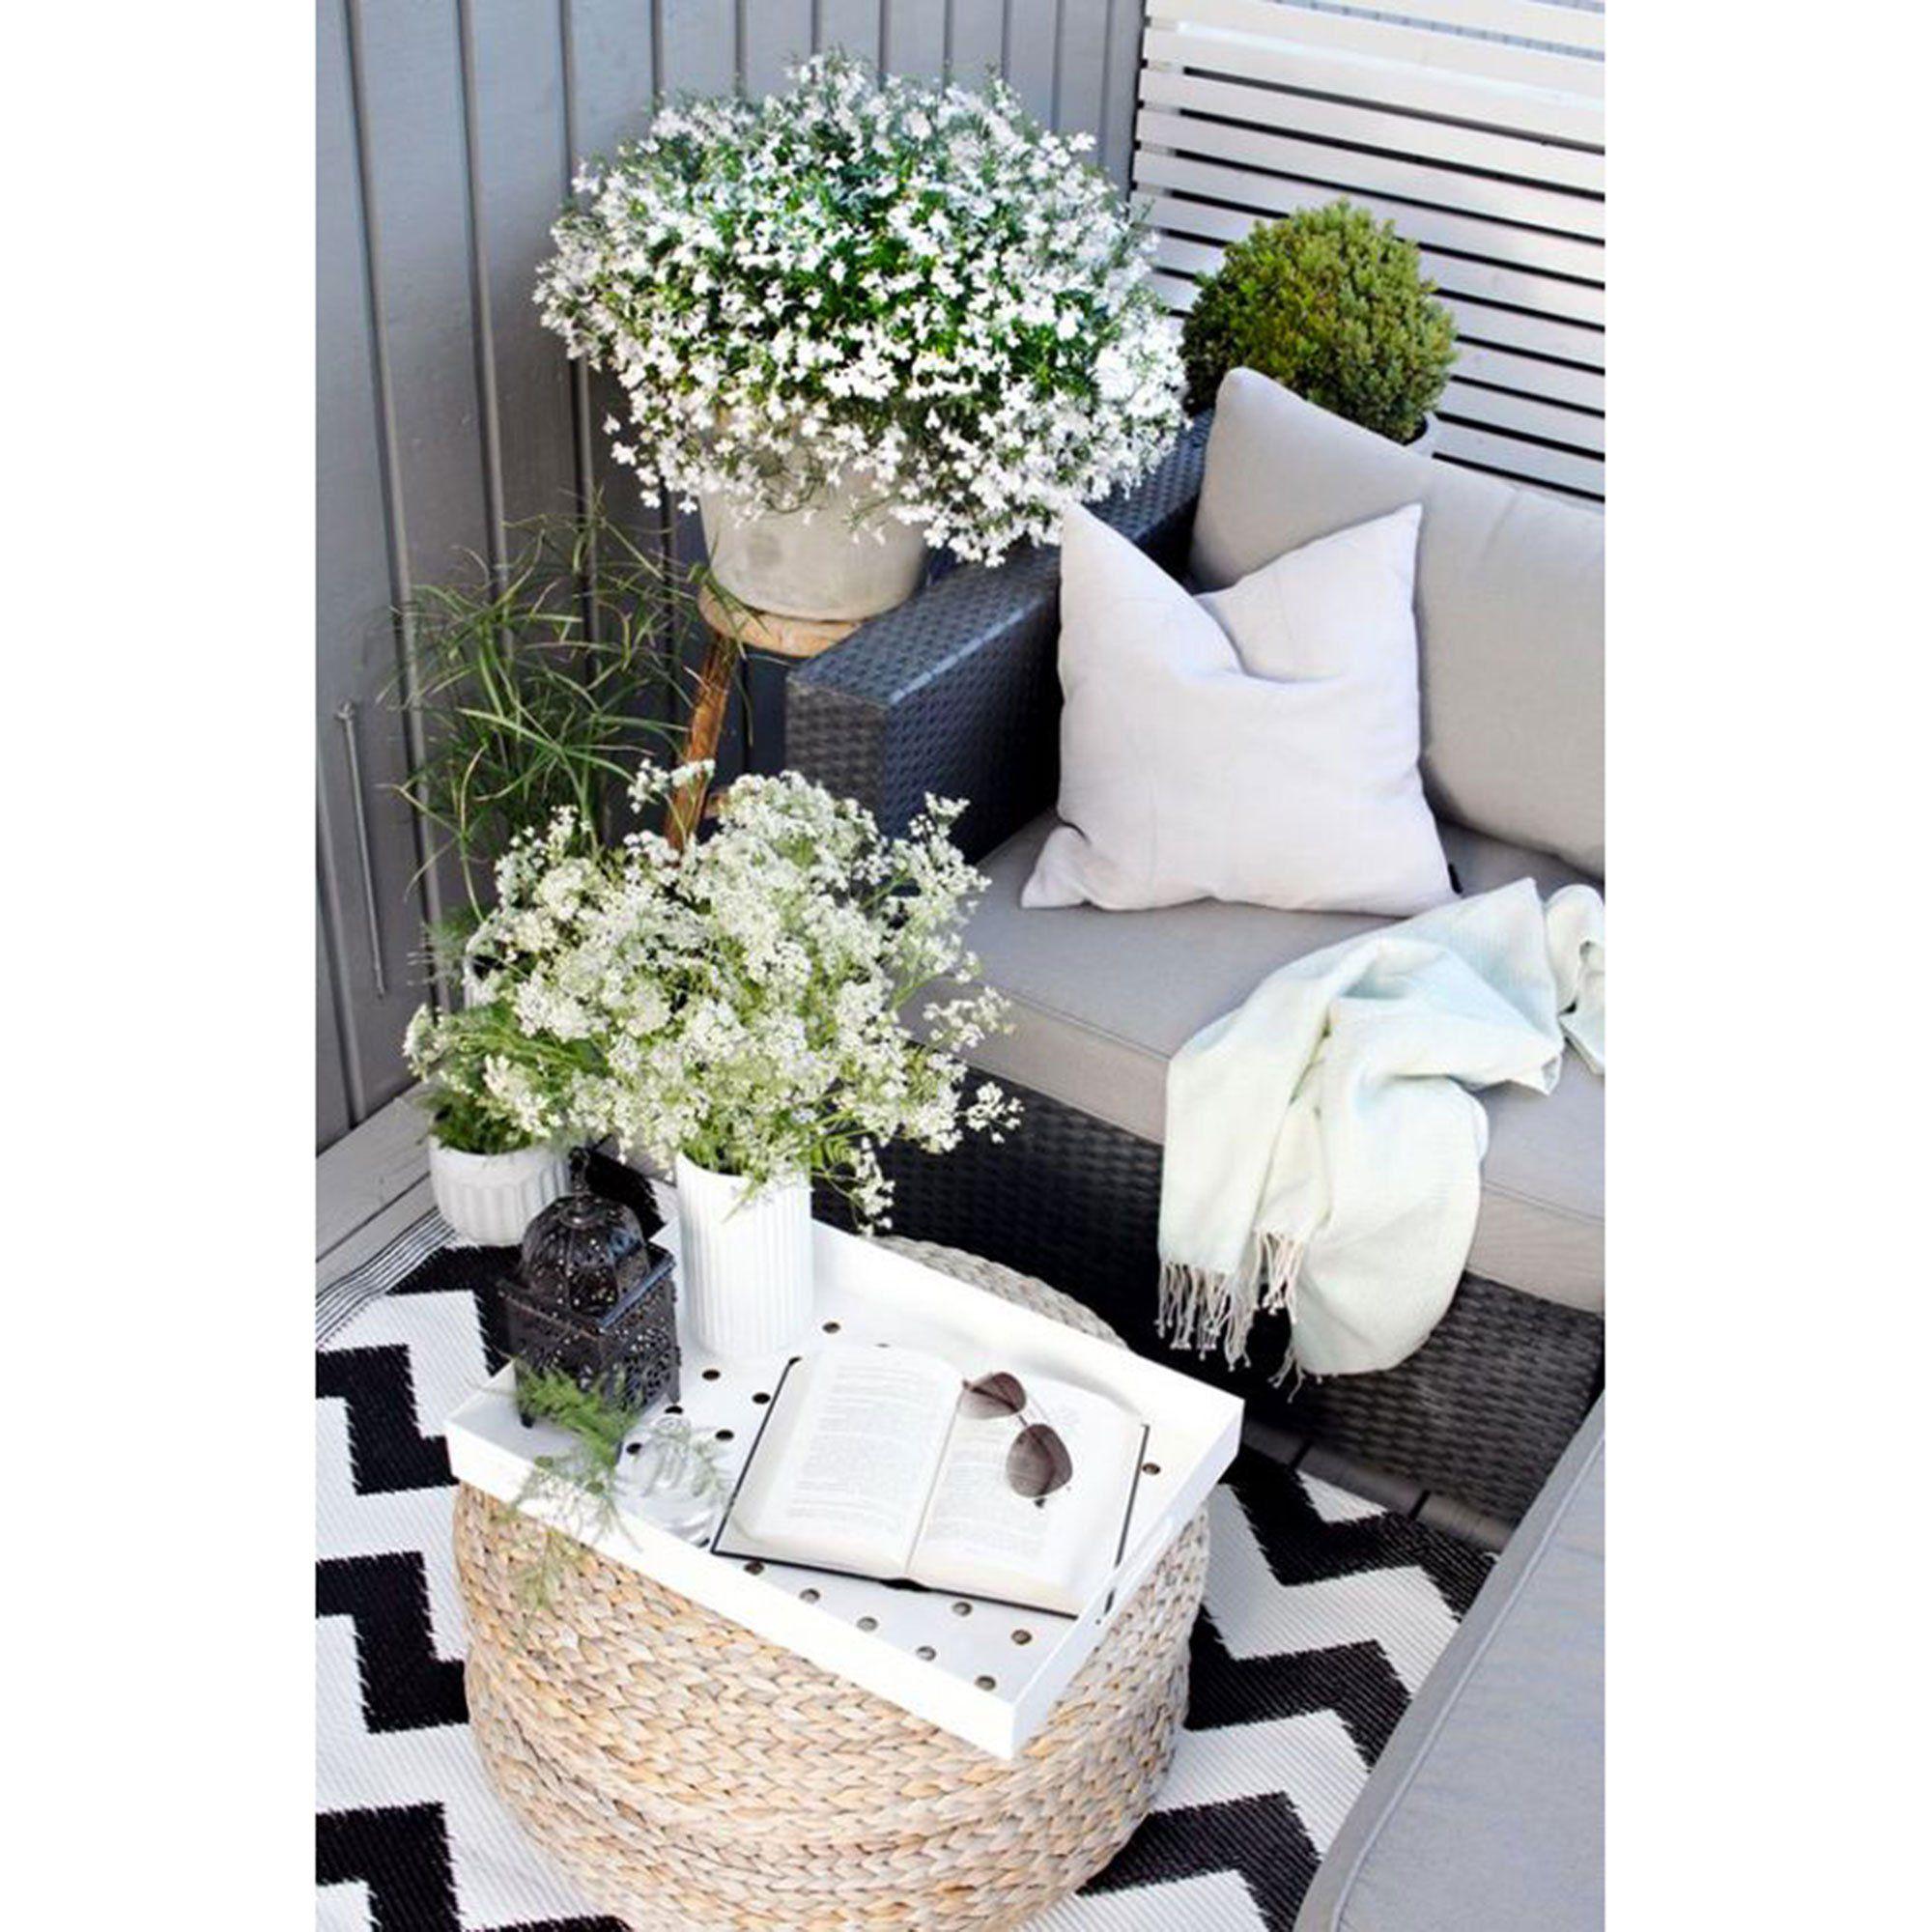 Plantes Fleurs Blanches Balcon Nord Balkon Meubels Appartement Balkon Decoreren Klein Balkon